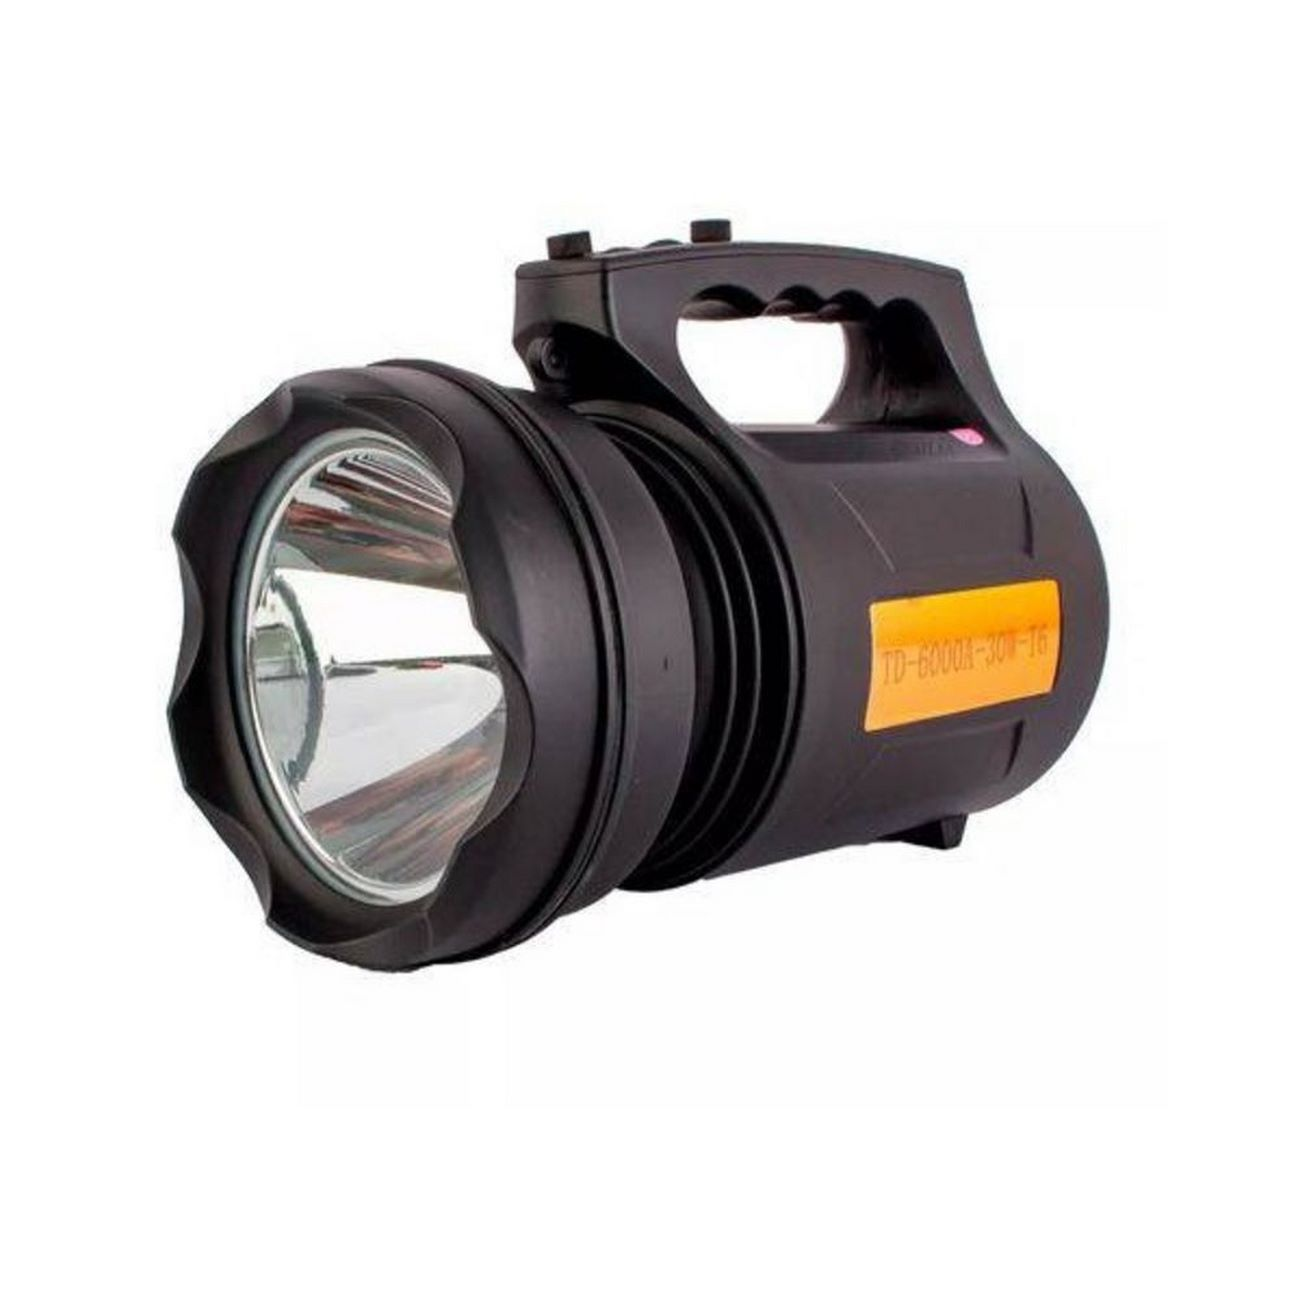 Lanterna Recarregável Holofote Potente Td 6000a 30w T6 Forte